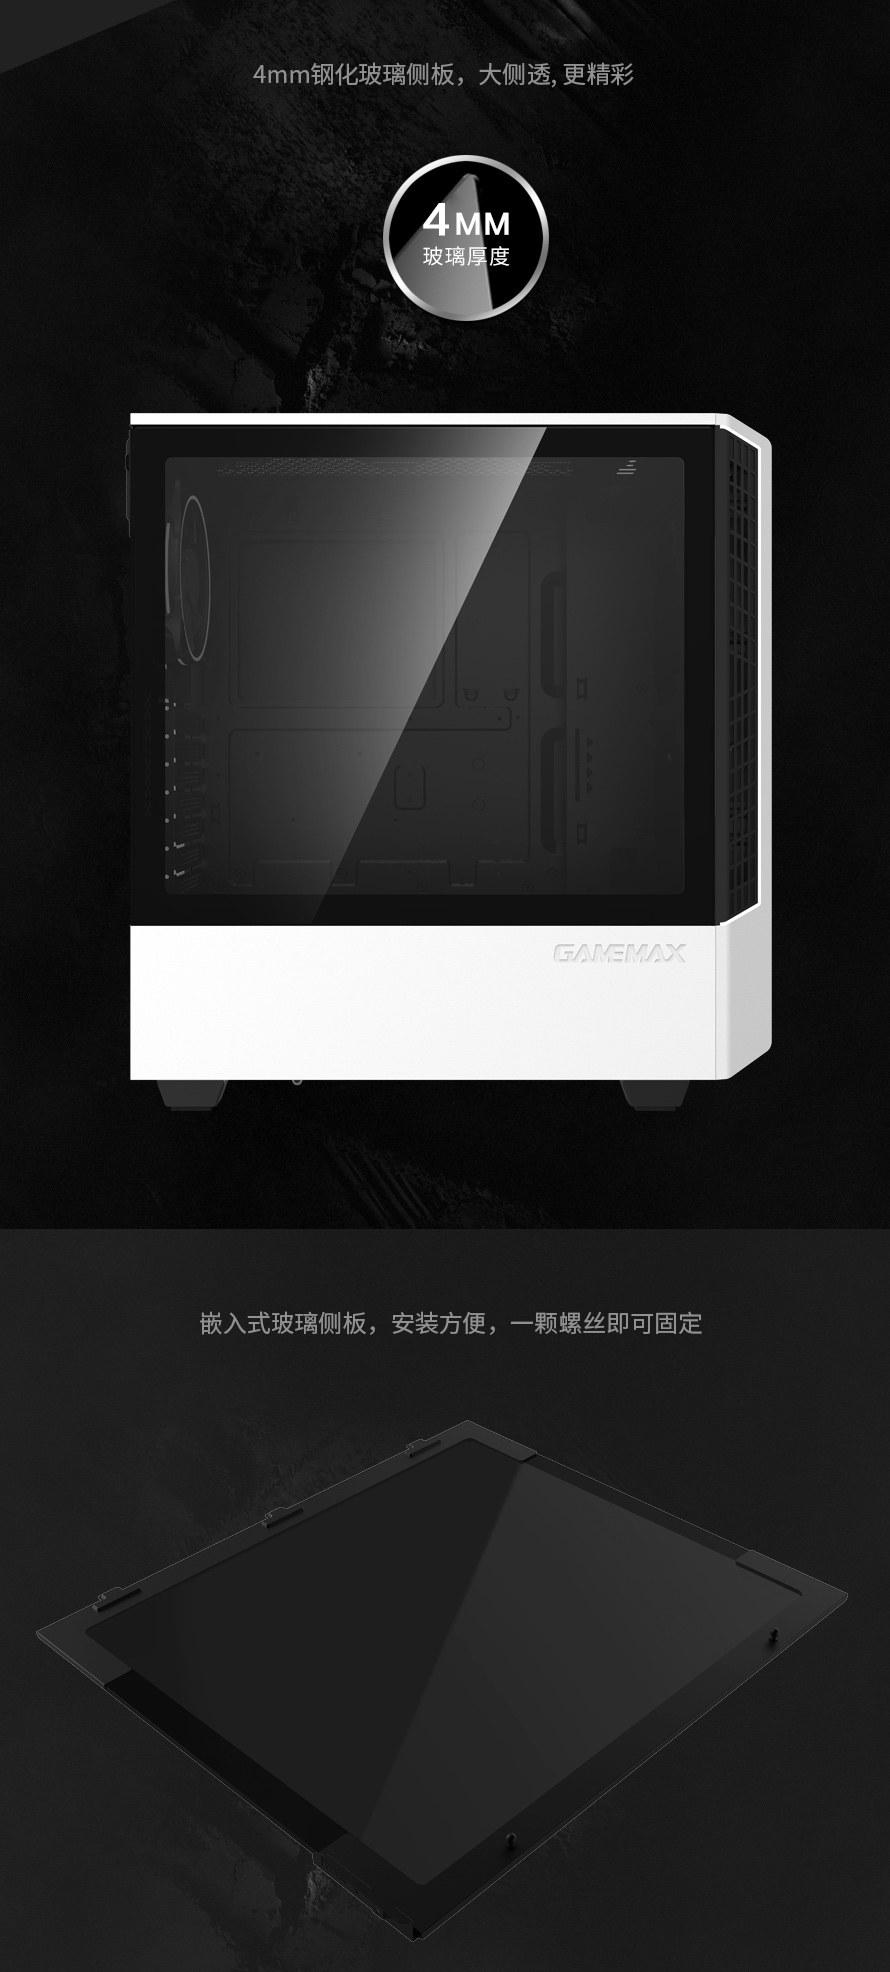 T802_Panda详情页中文_看图王_04.jpg